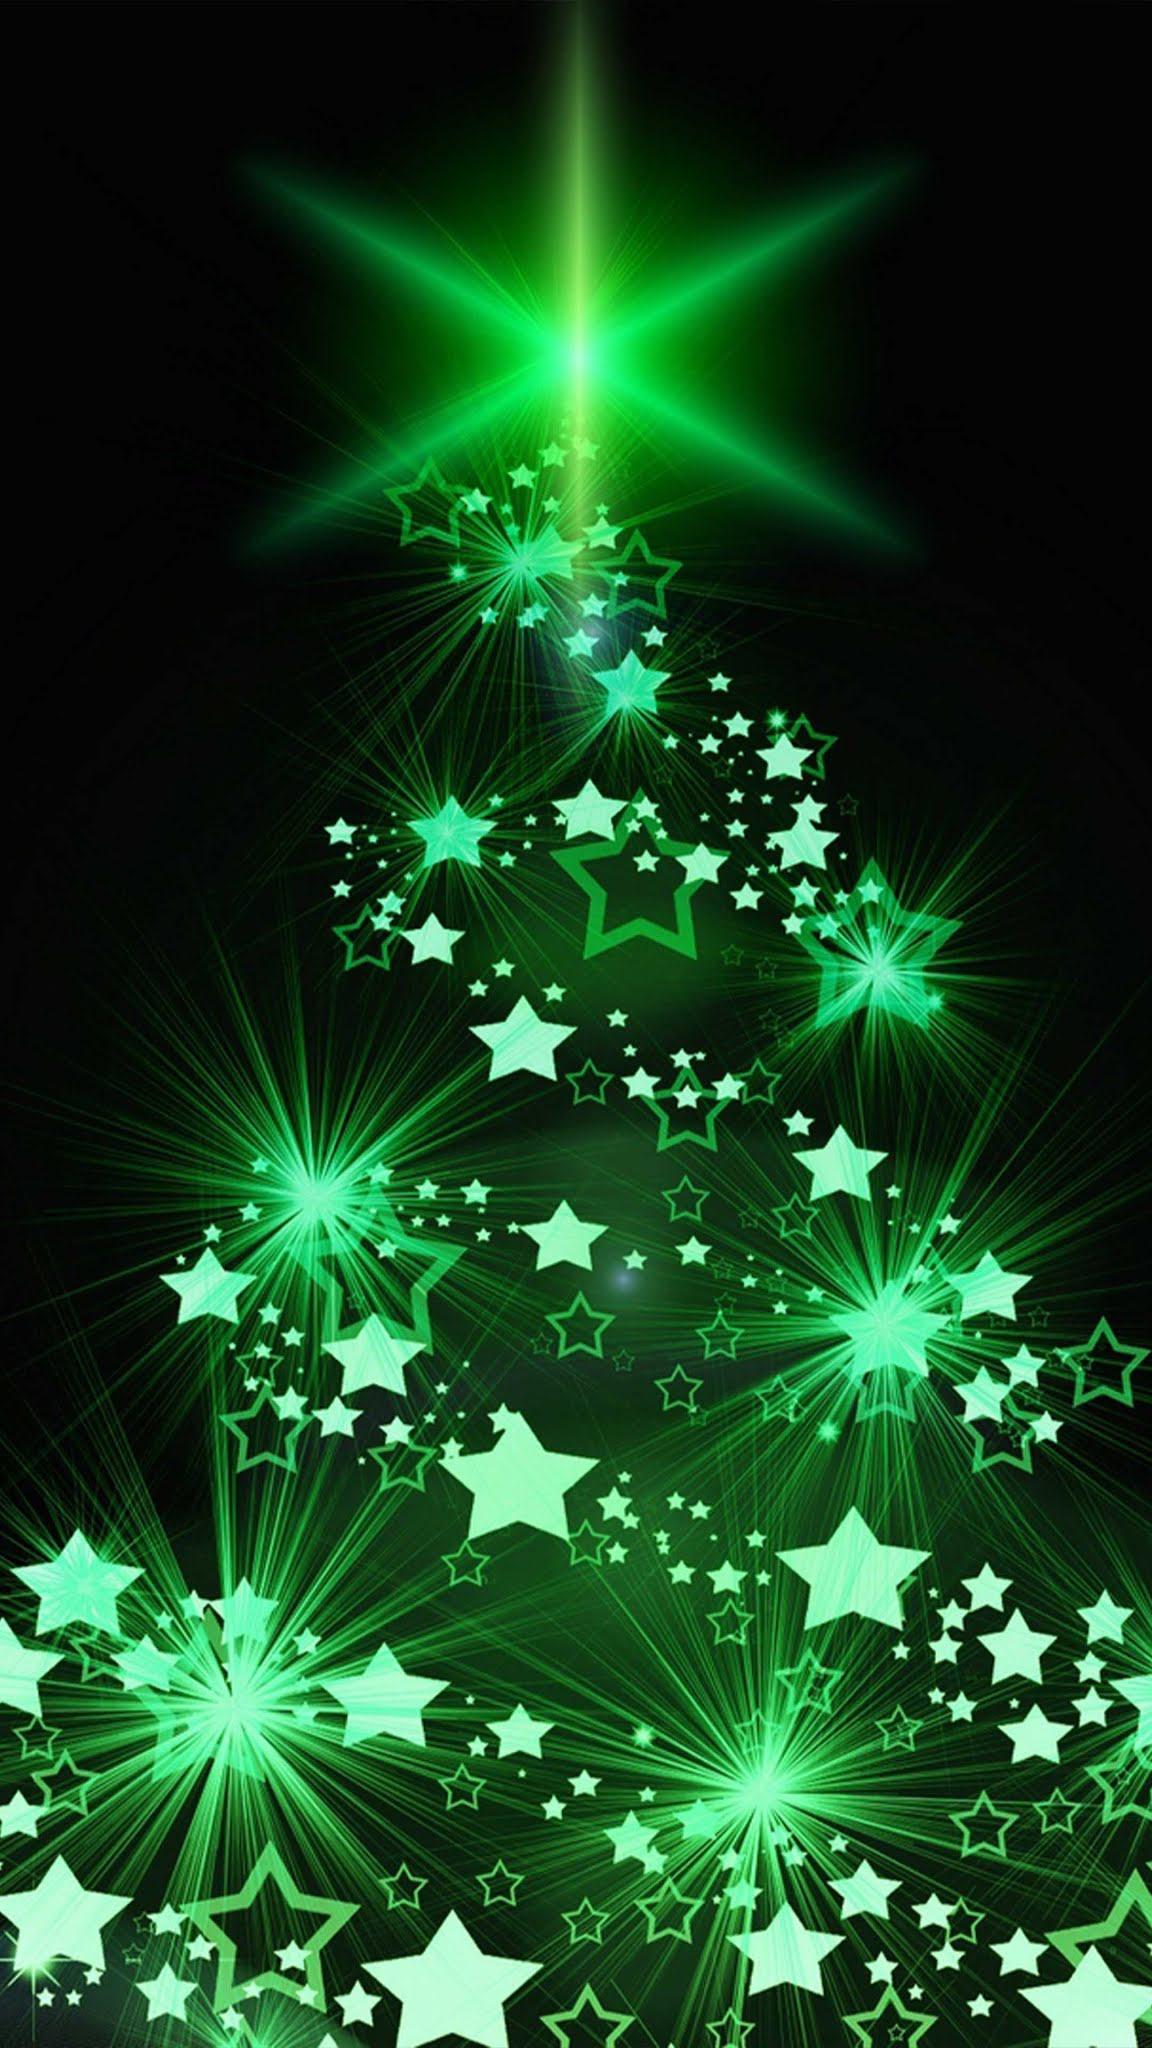 Christmas Tree Green Lights Mobile Wallpaper